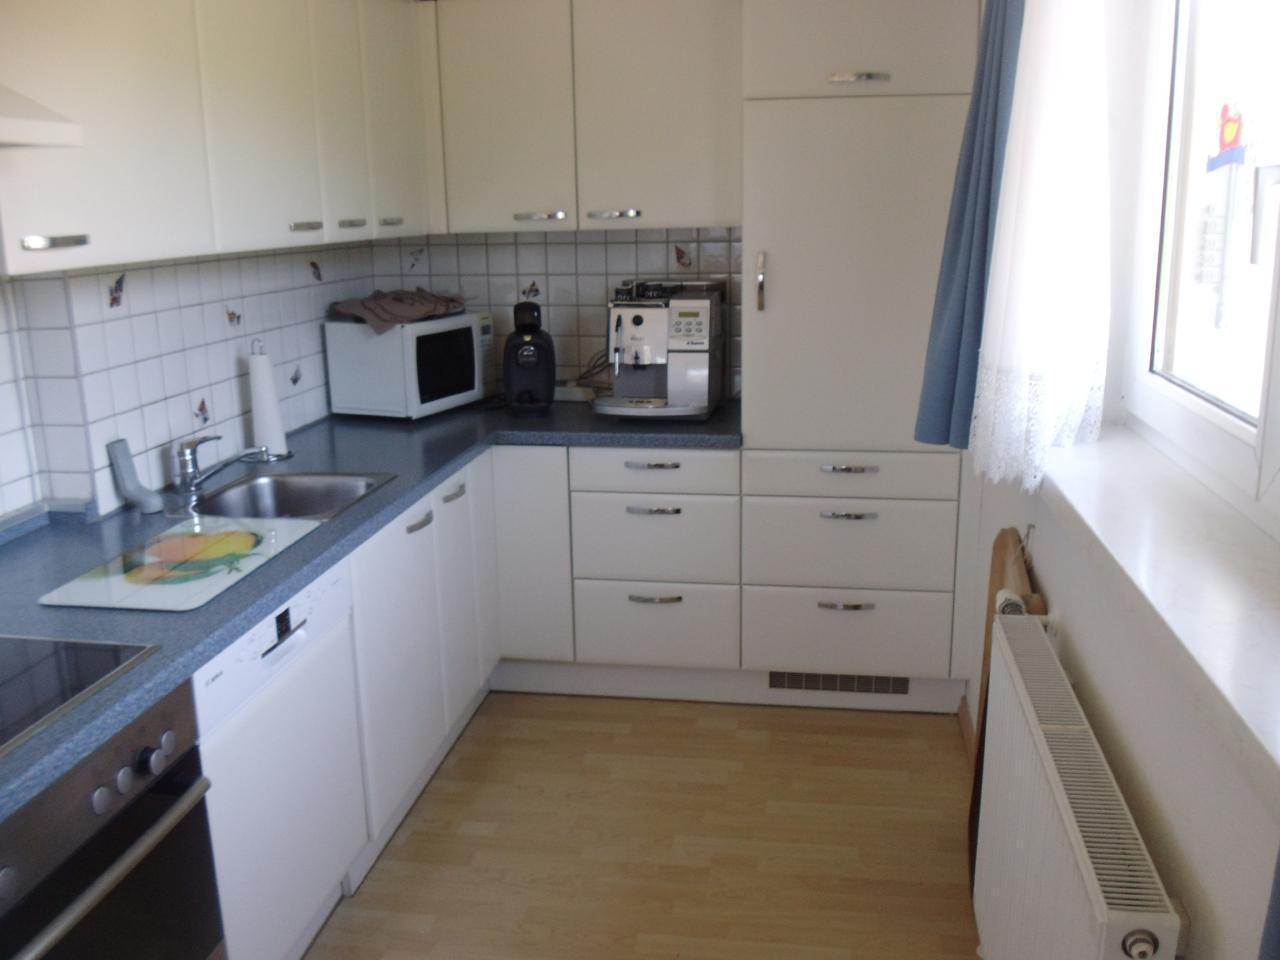 Appartement de vacances Appartement Draublick (500286), Neuhaus (Klopeiner See), Lac Klopein, Carinthie, Autriche, image 7